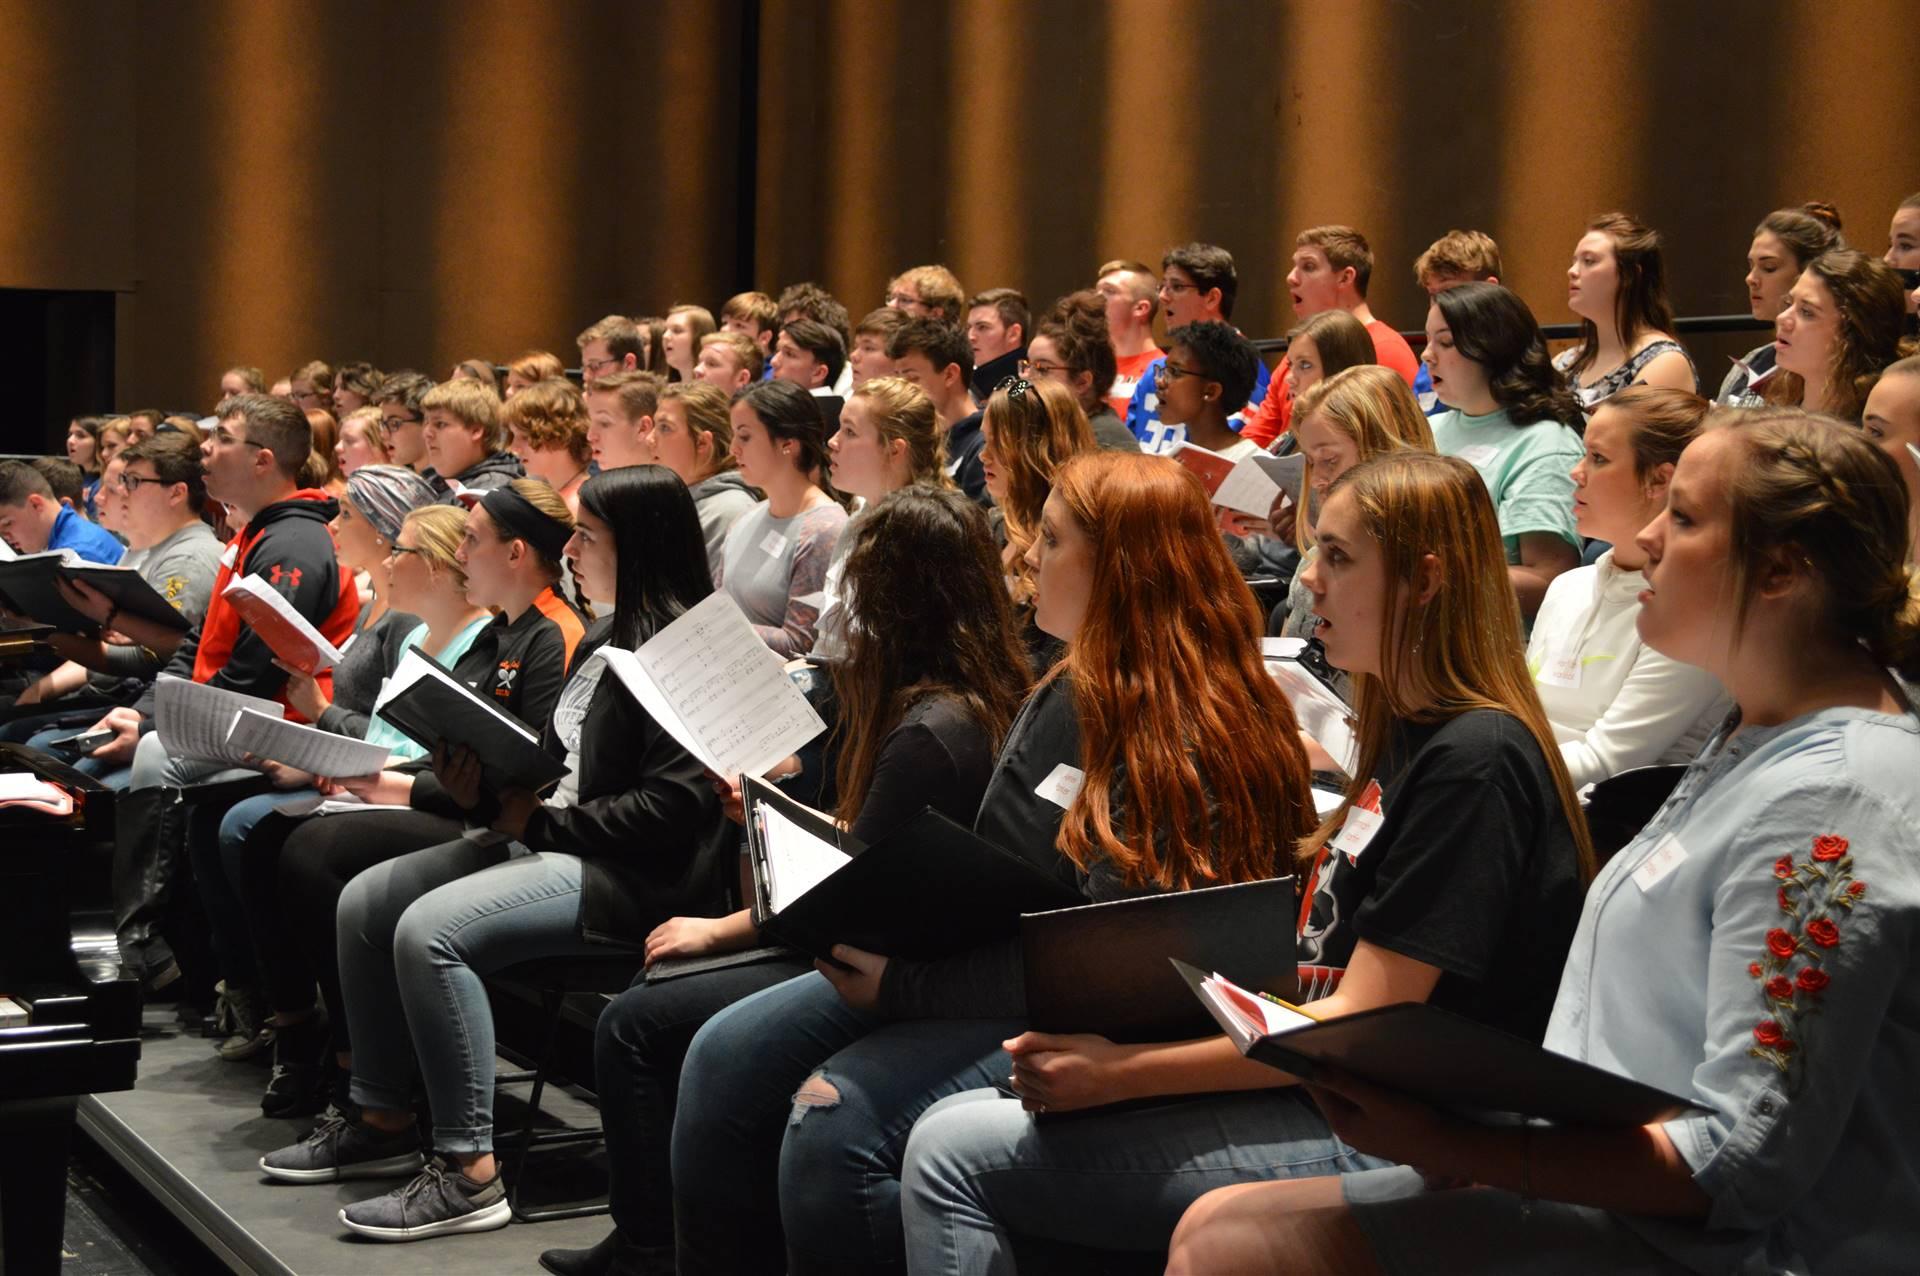 2018 Scioto County Honors High School Choir